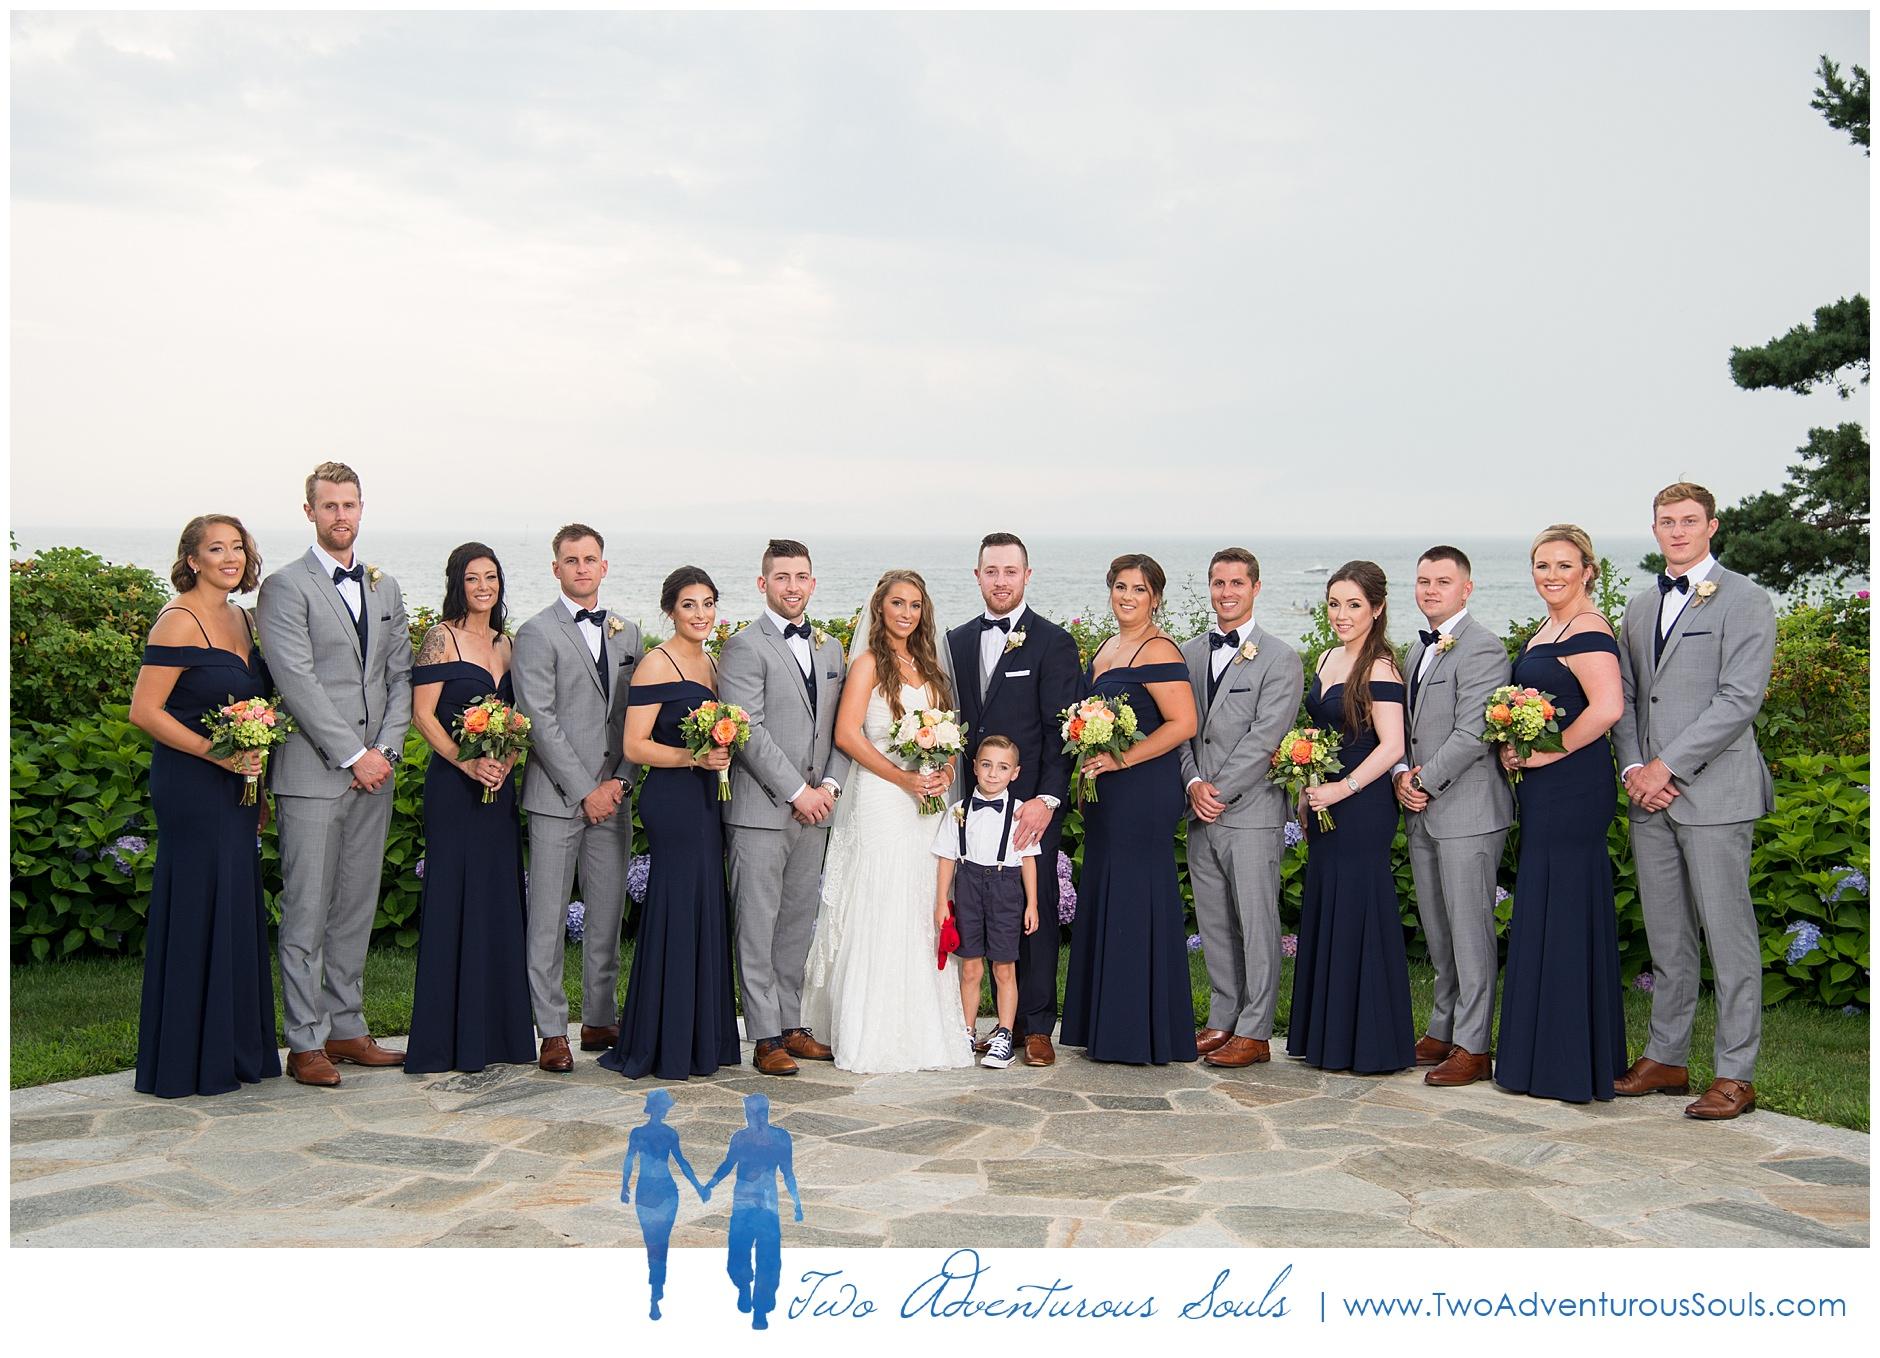 Wedding Day Family Portraits, Wedding Planning, Maine Wedding Photographers, Two Adventurous Souls_WDFPP_0002.jpg